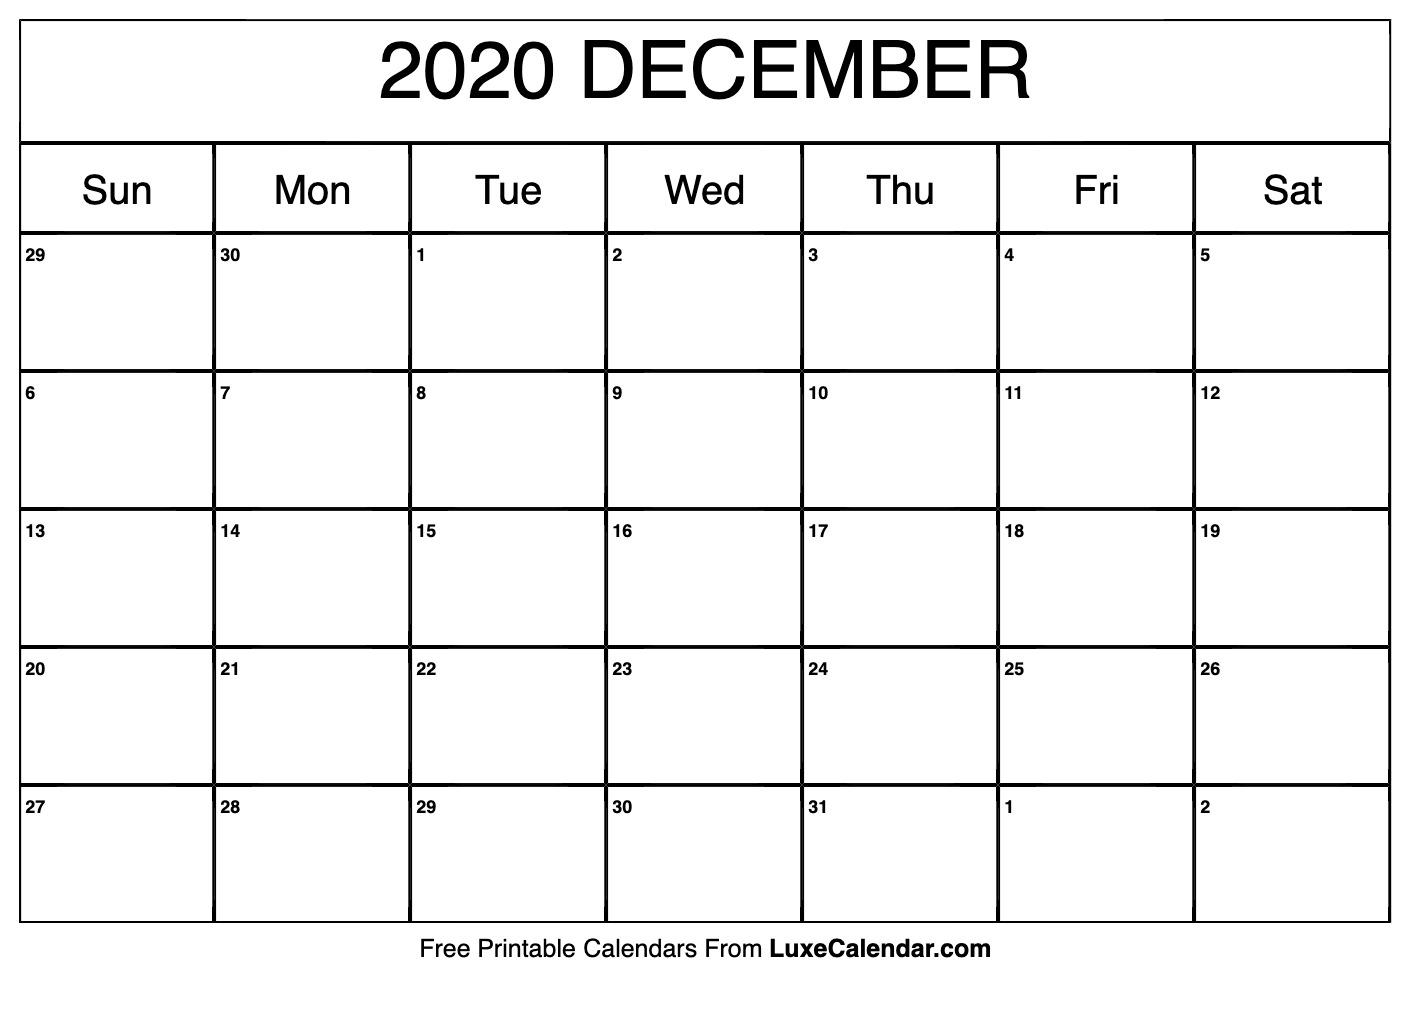 Blank December 2020 Calendar Printable - Luxe Calendar